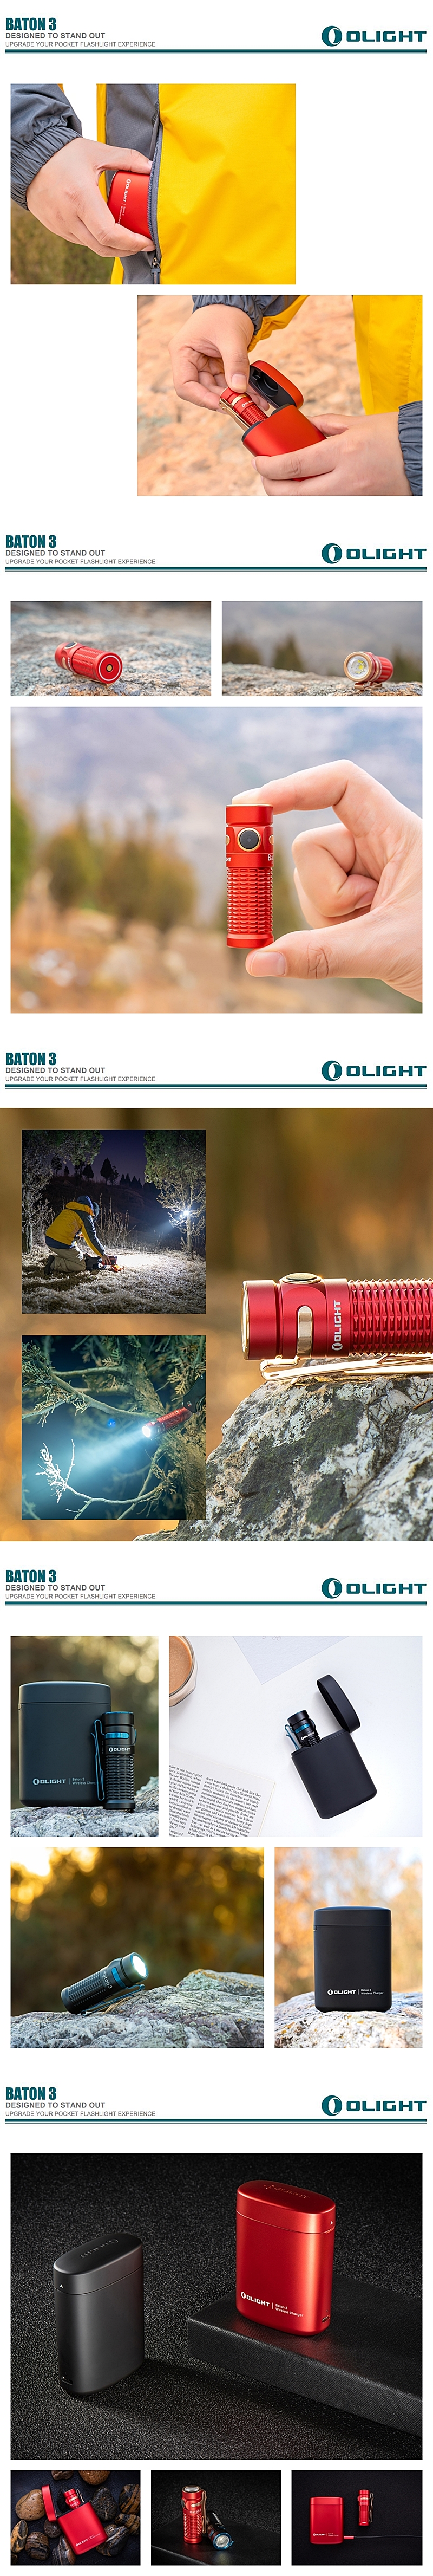 Olight Baton 3 Premium Edition  1,200 lumens powerful Baton 3 and portable wireless charger (4)